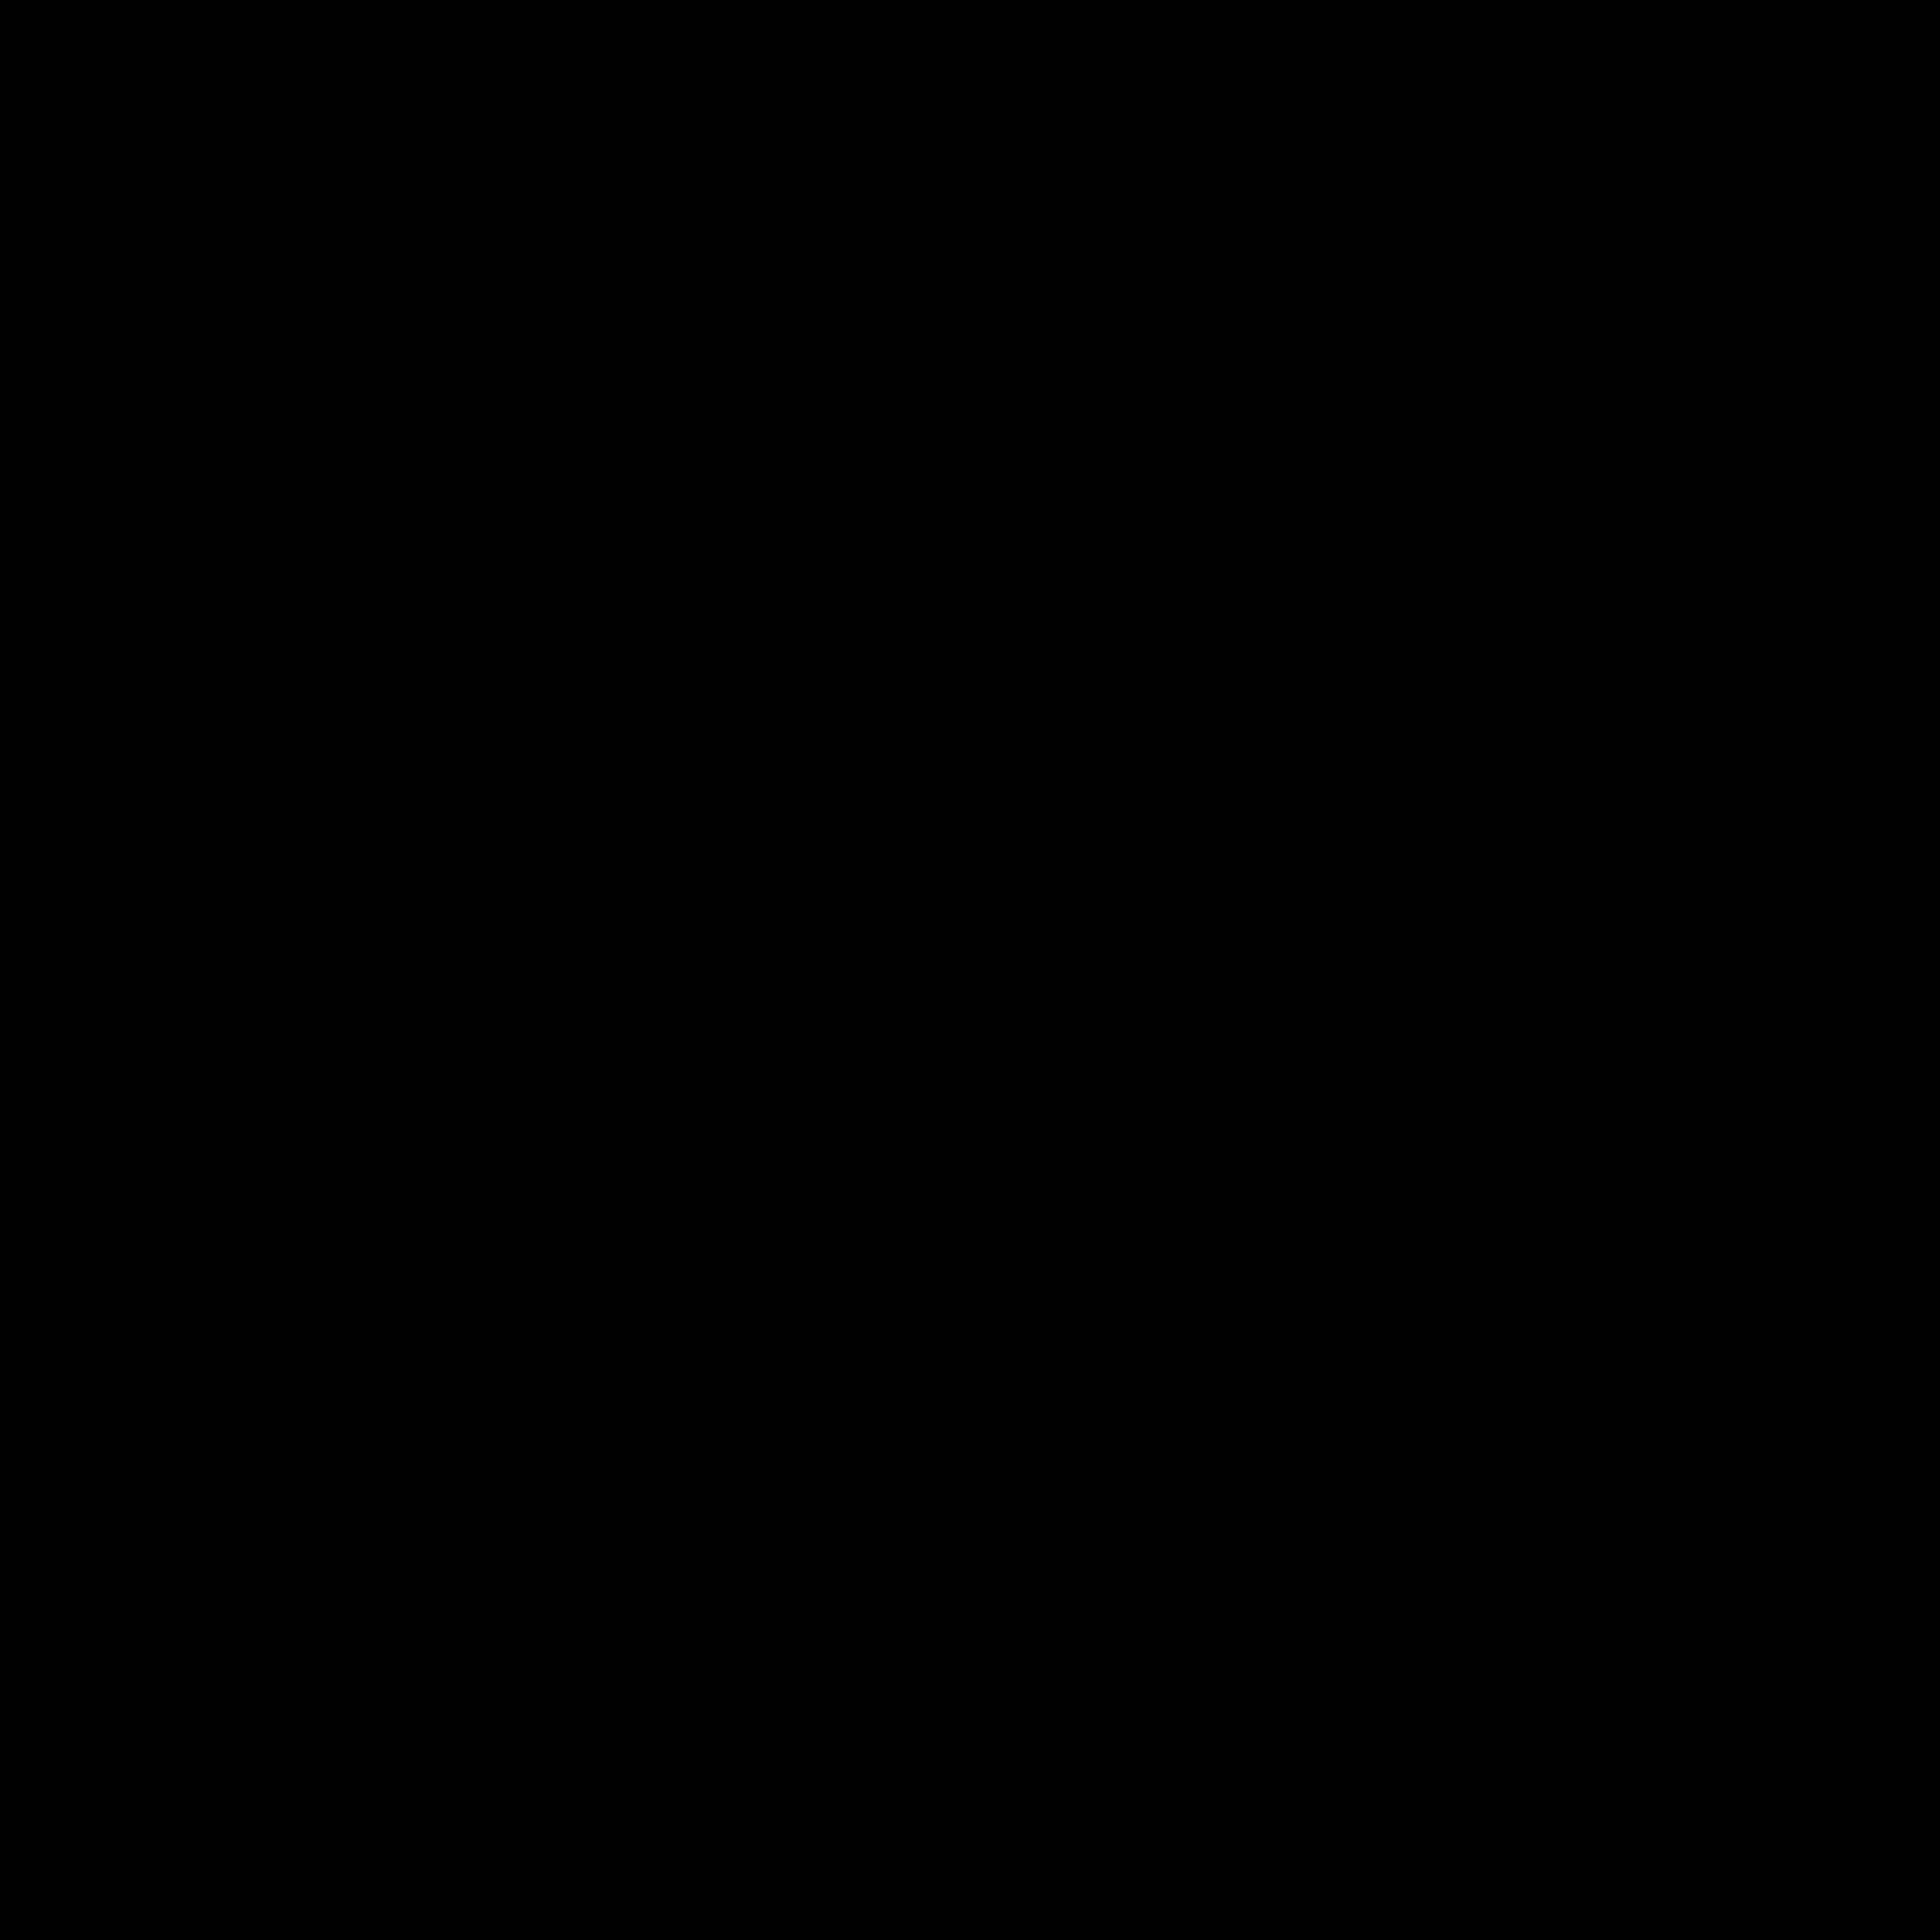 Ray Ban Logo PNG Transparent & SVG Vector.